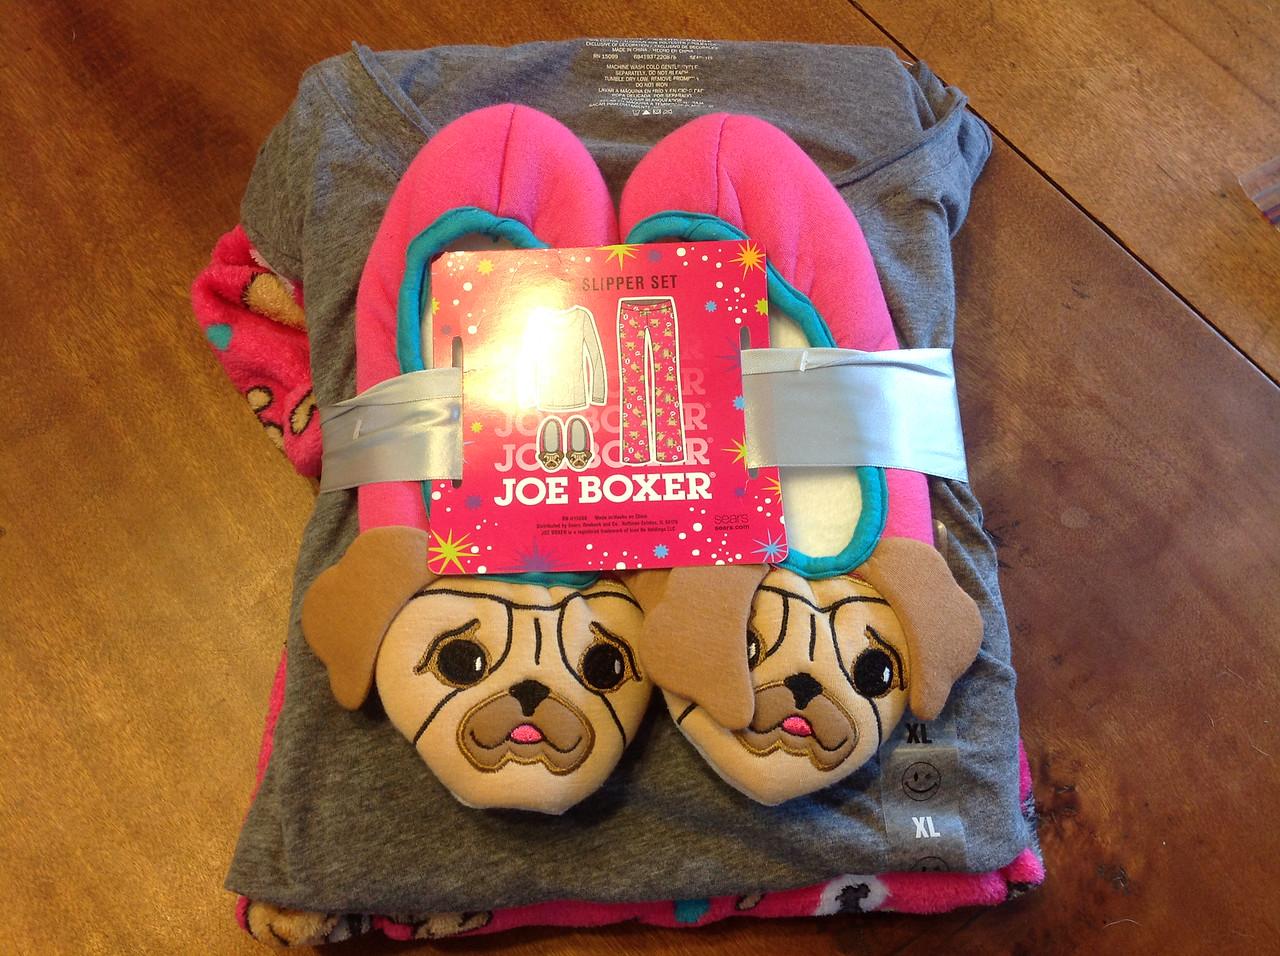 3 piece pajama and slipper set - size XL. Super soft!<br /> <br /> Winner pays shipping<br /> <br /> Starting bid $10